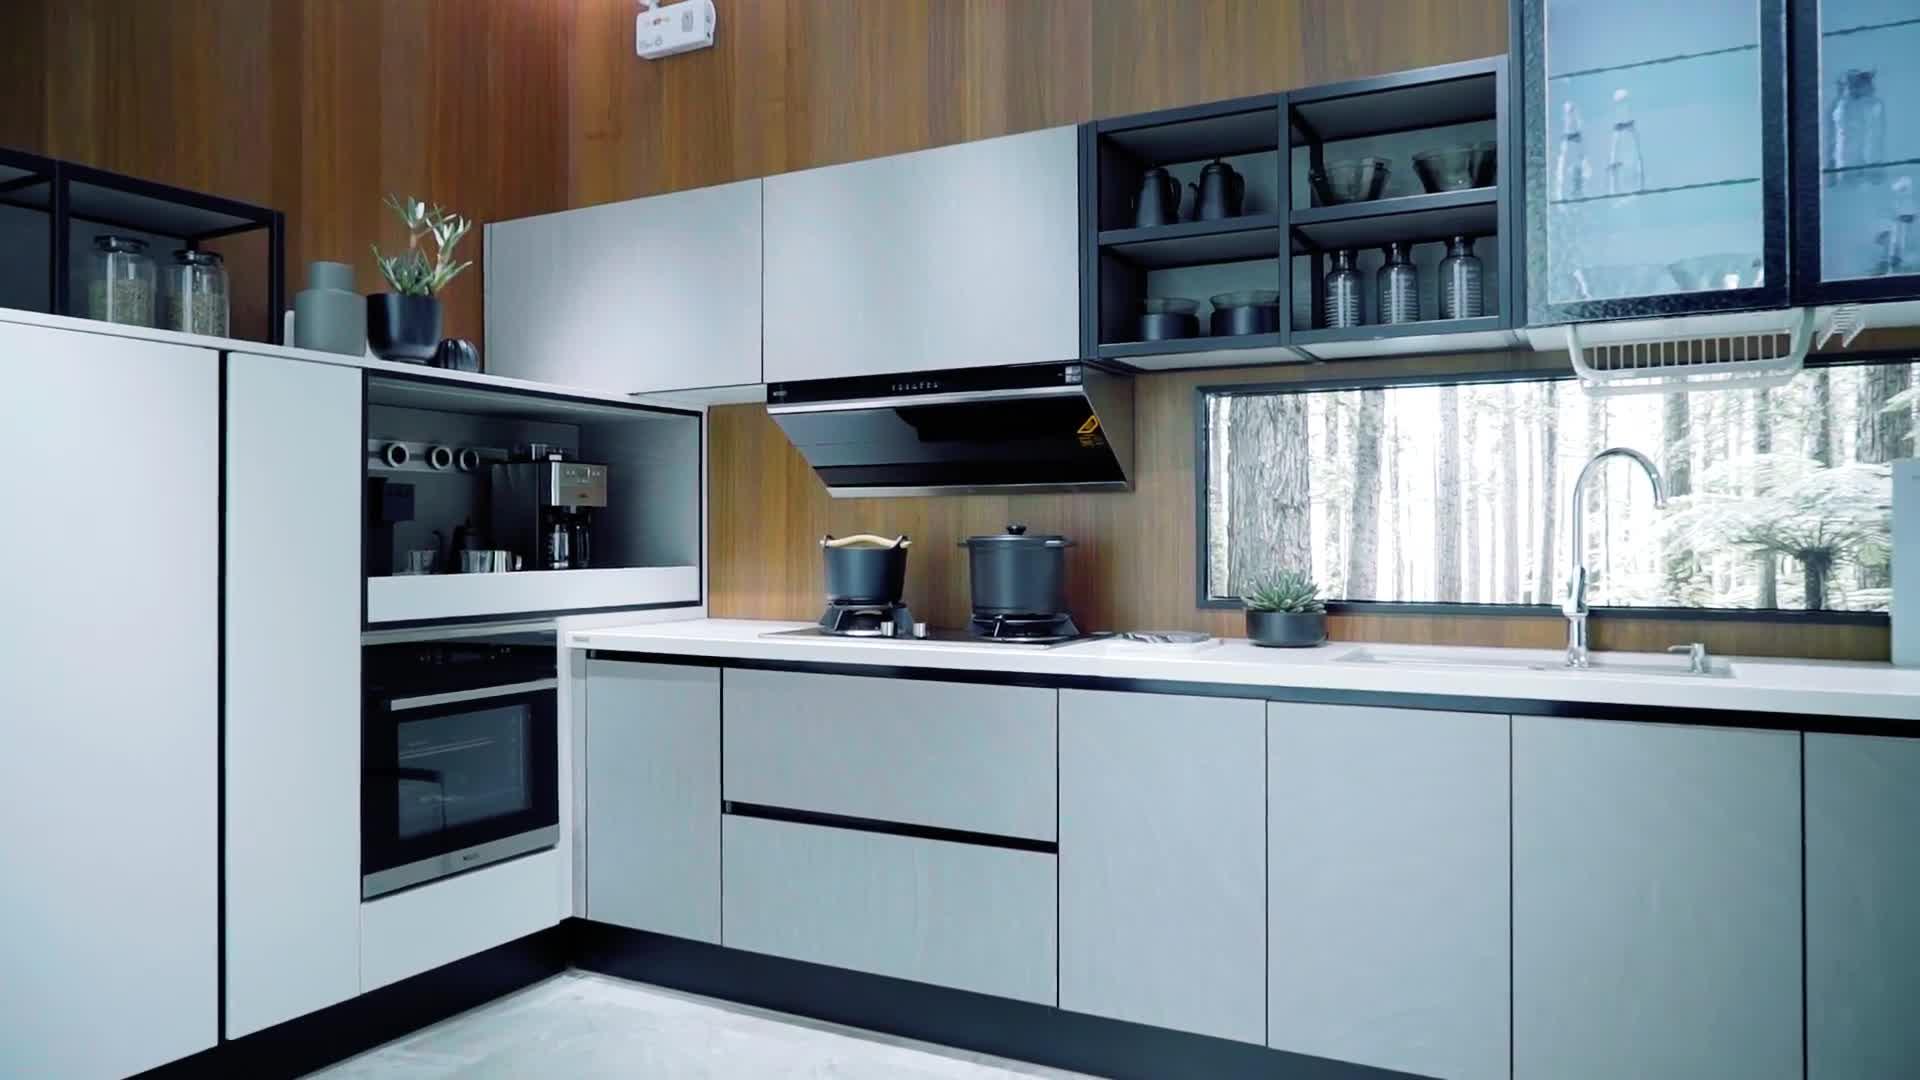 Oppein Vietnam Contemporary Kitchen Cabinets Designs For